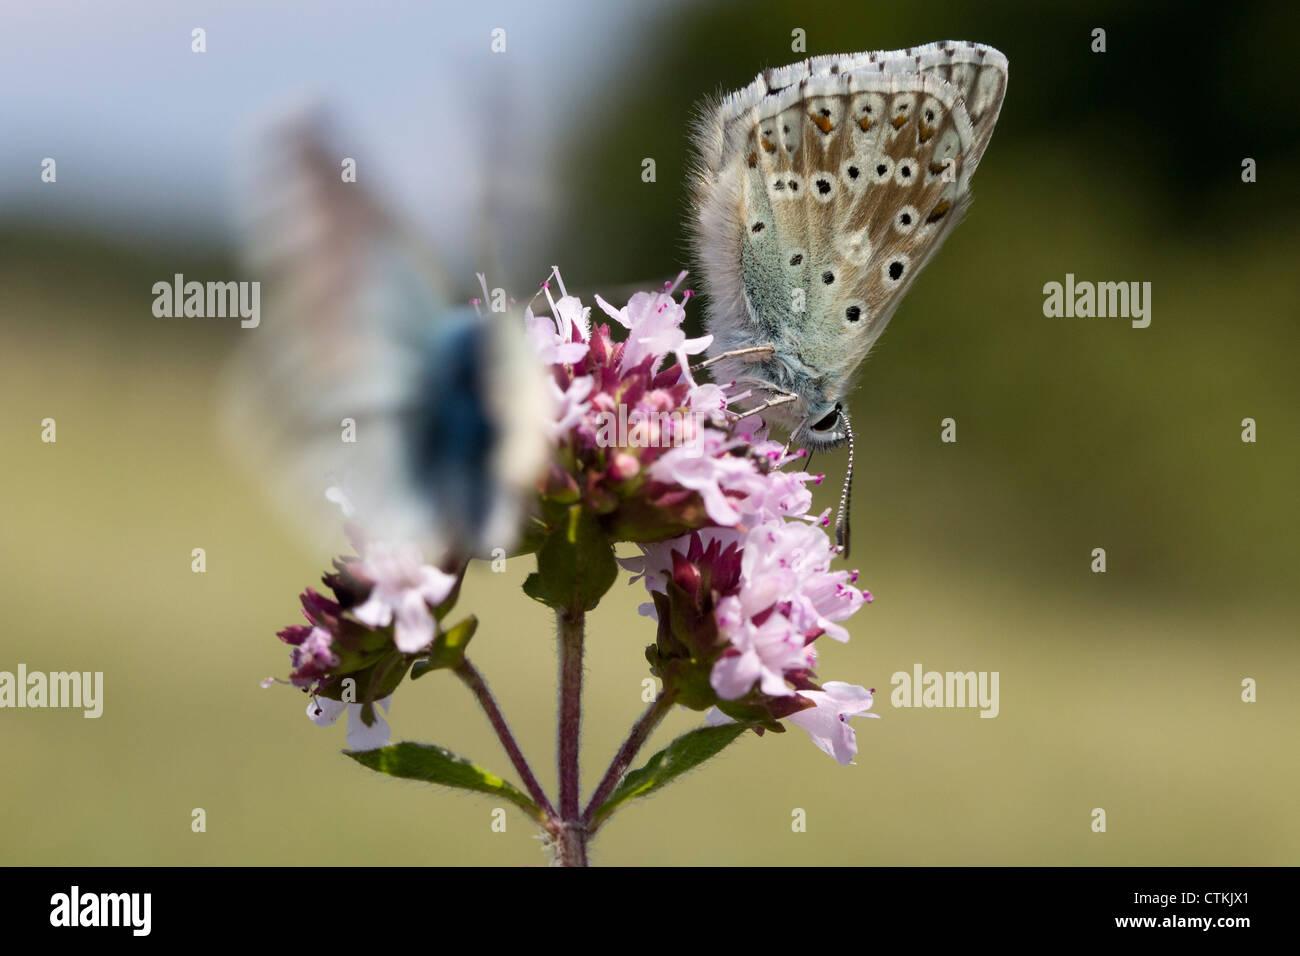 Chalkhill blue butterflies (Lysandra coridon) on marjoram. Surrey, UK. - Stock Image